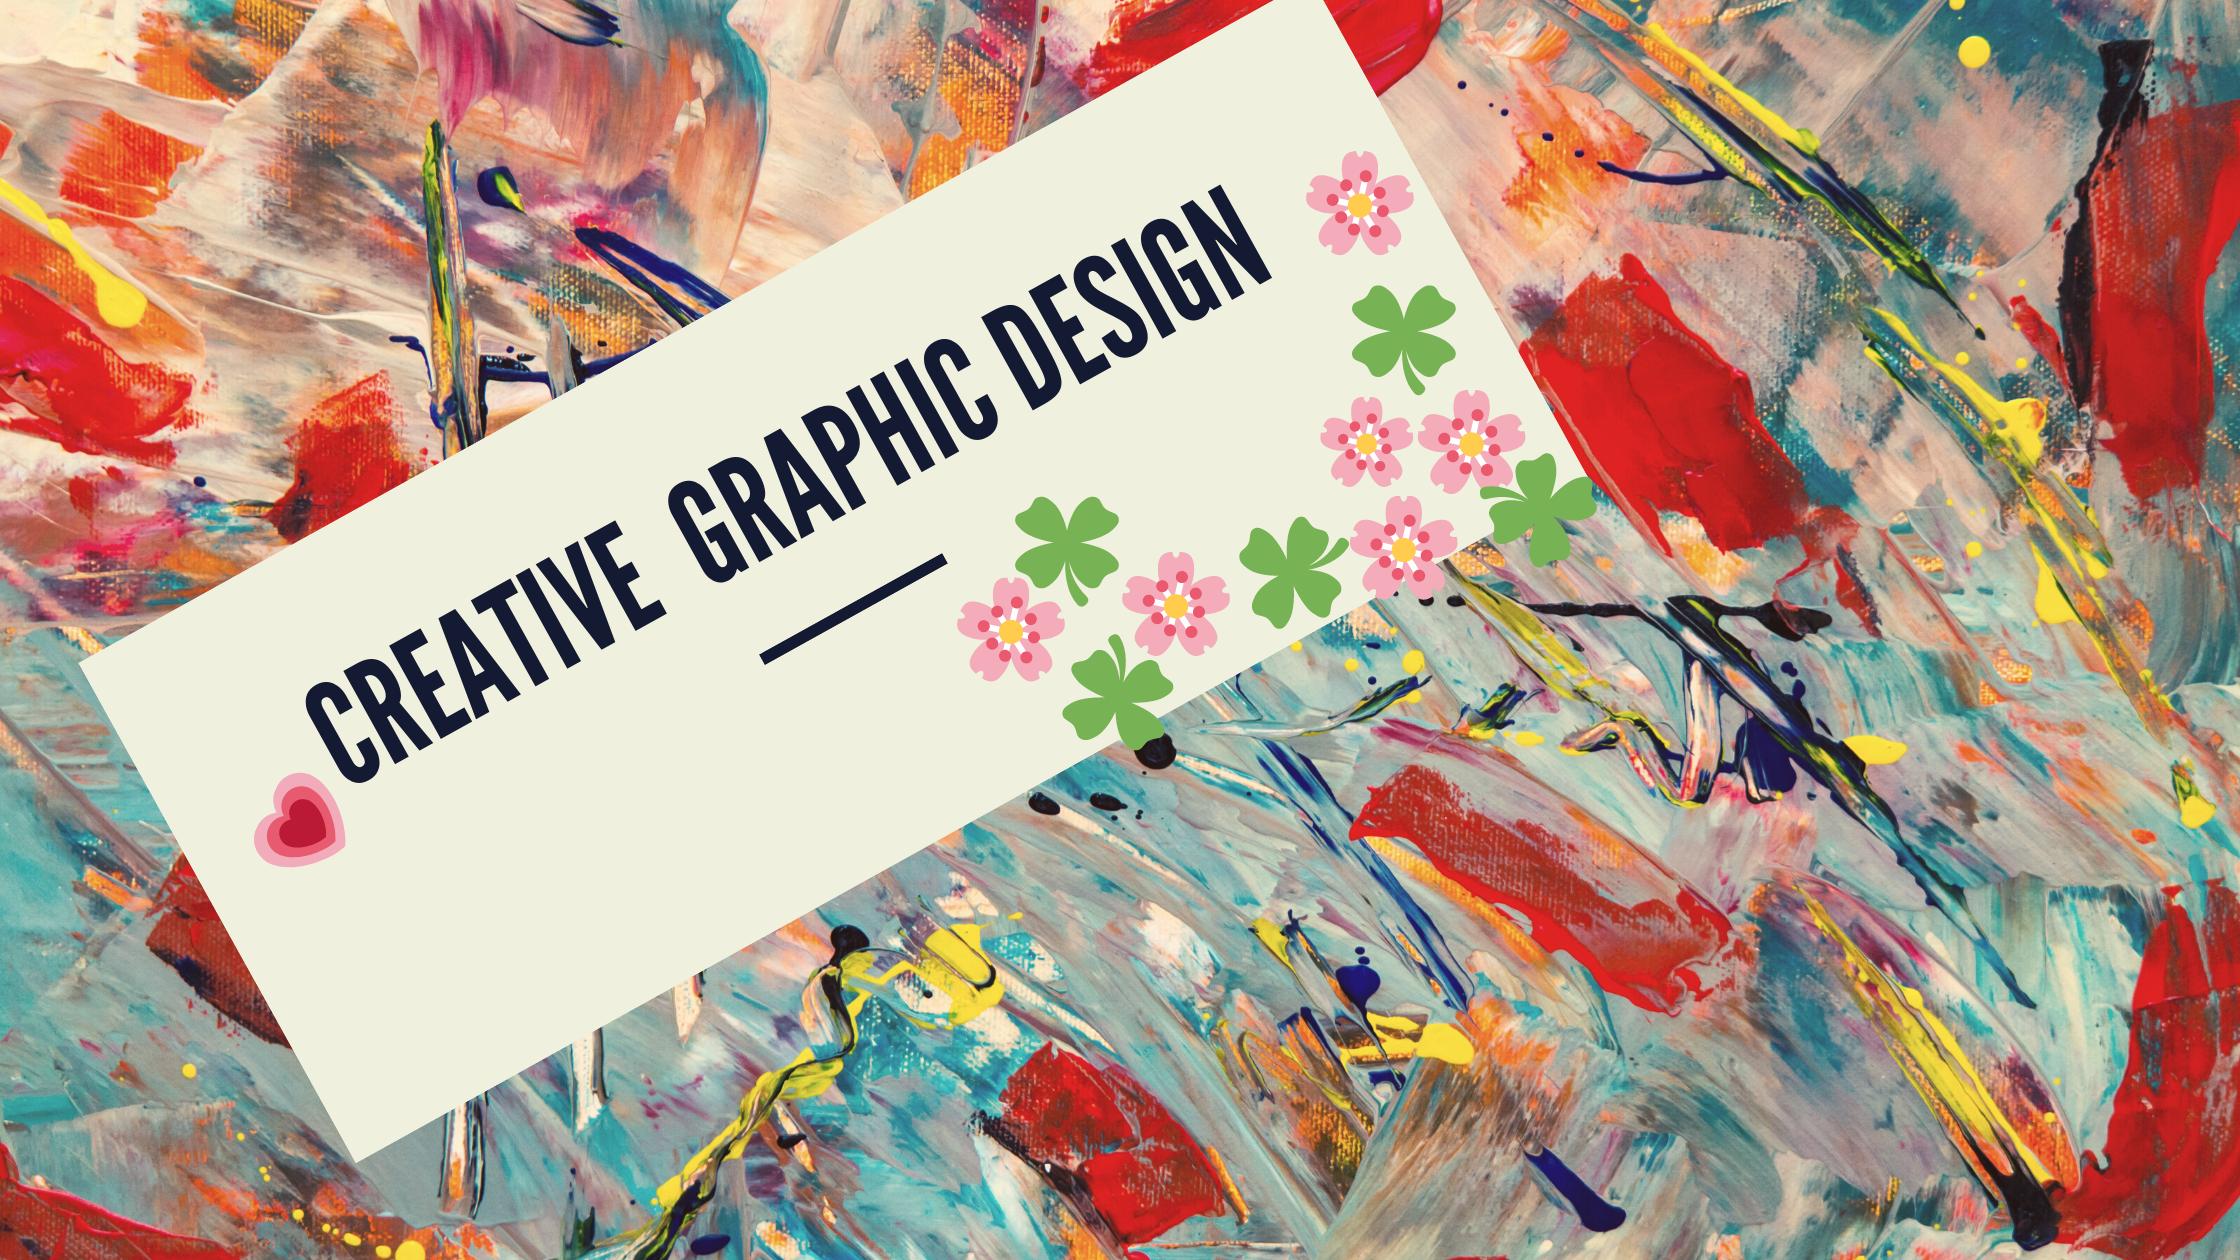 I will do any creative graphic design